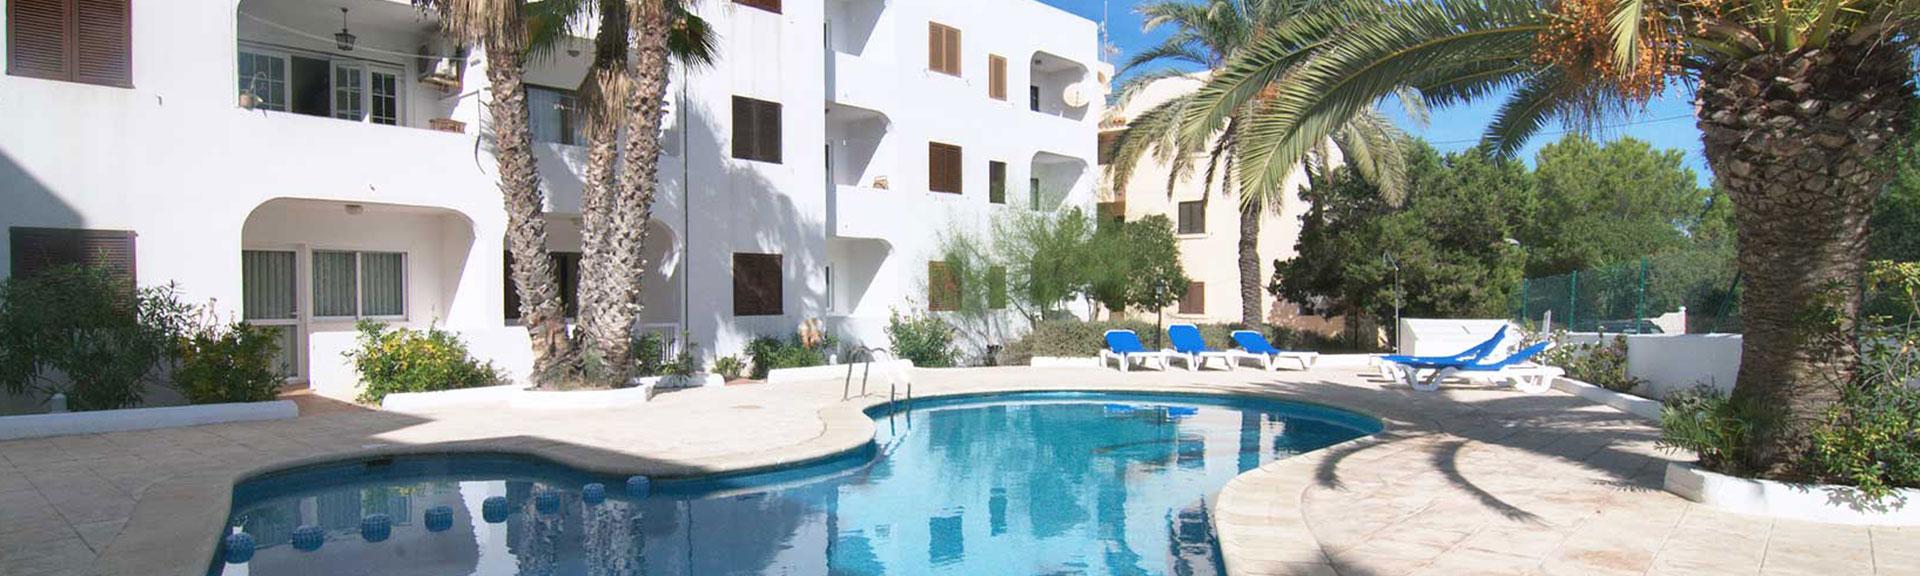 appartamenti sulla spiaggia di es pujols, a formentera | costamar ii